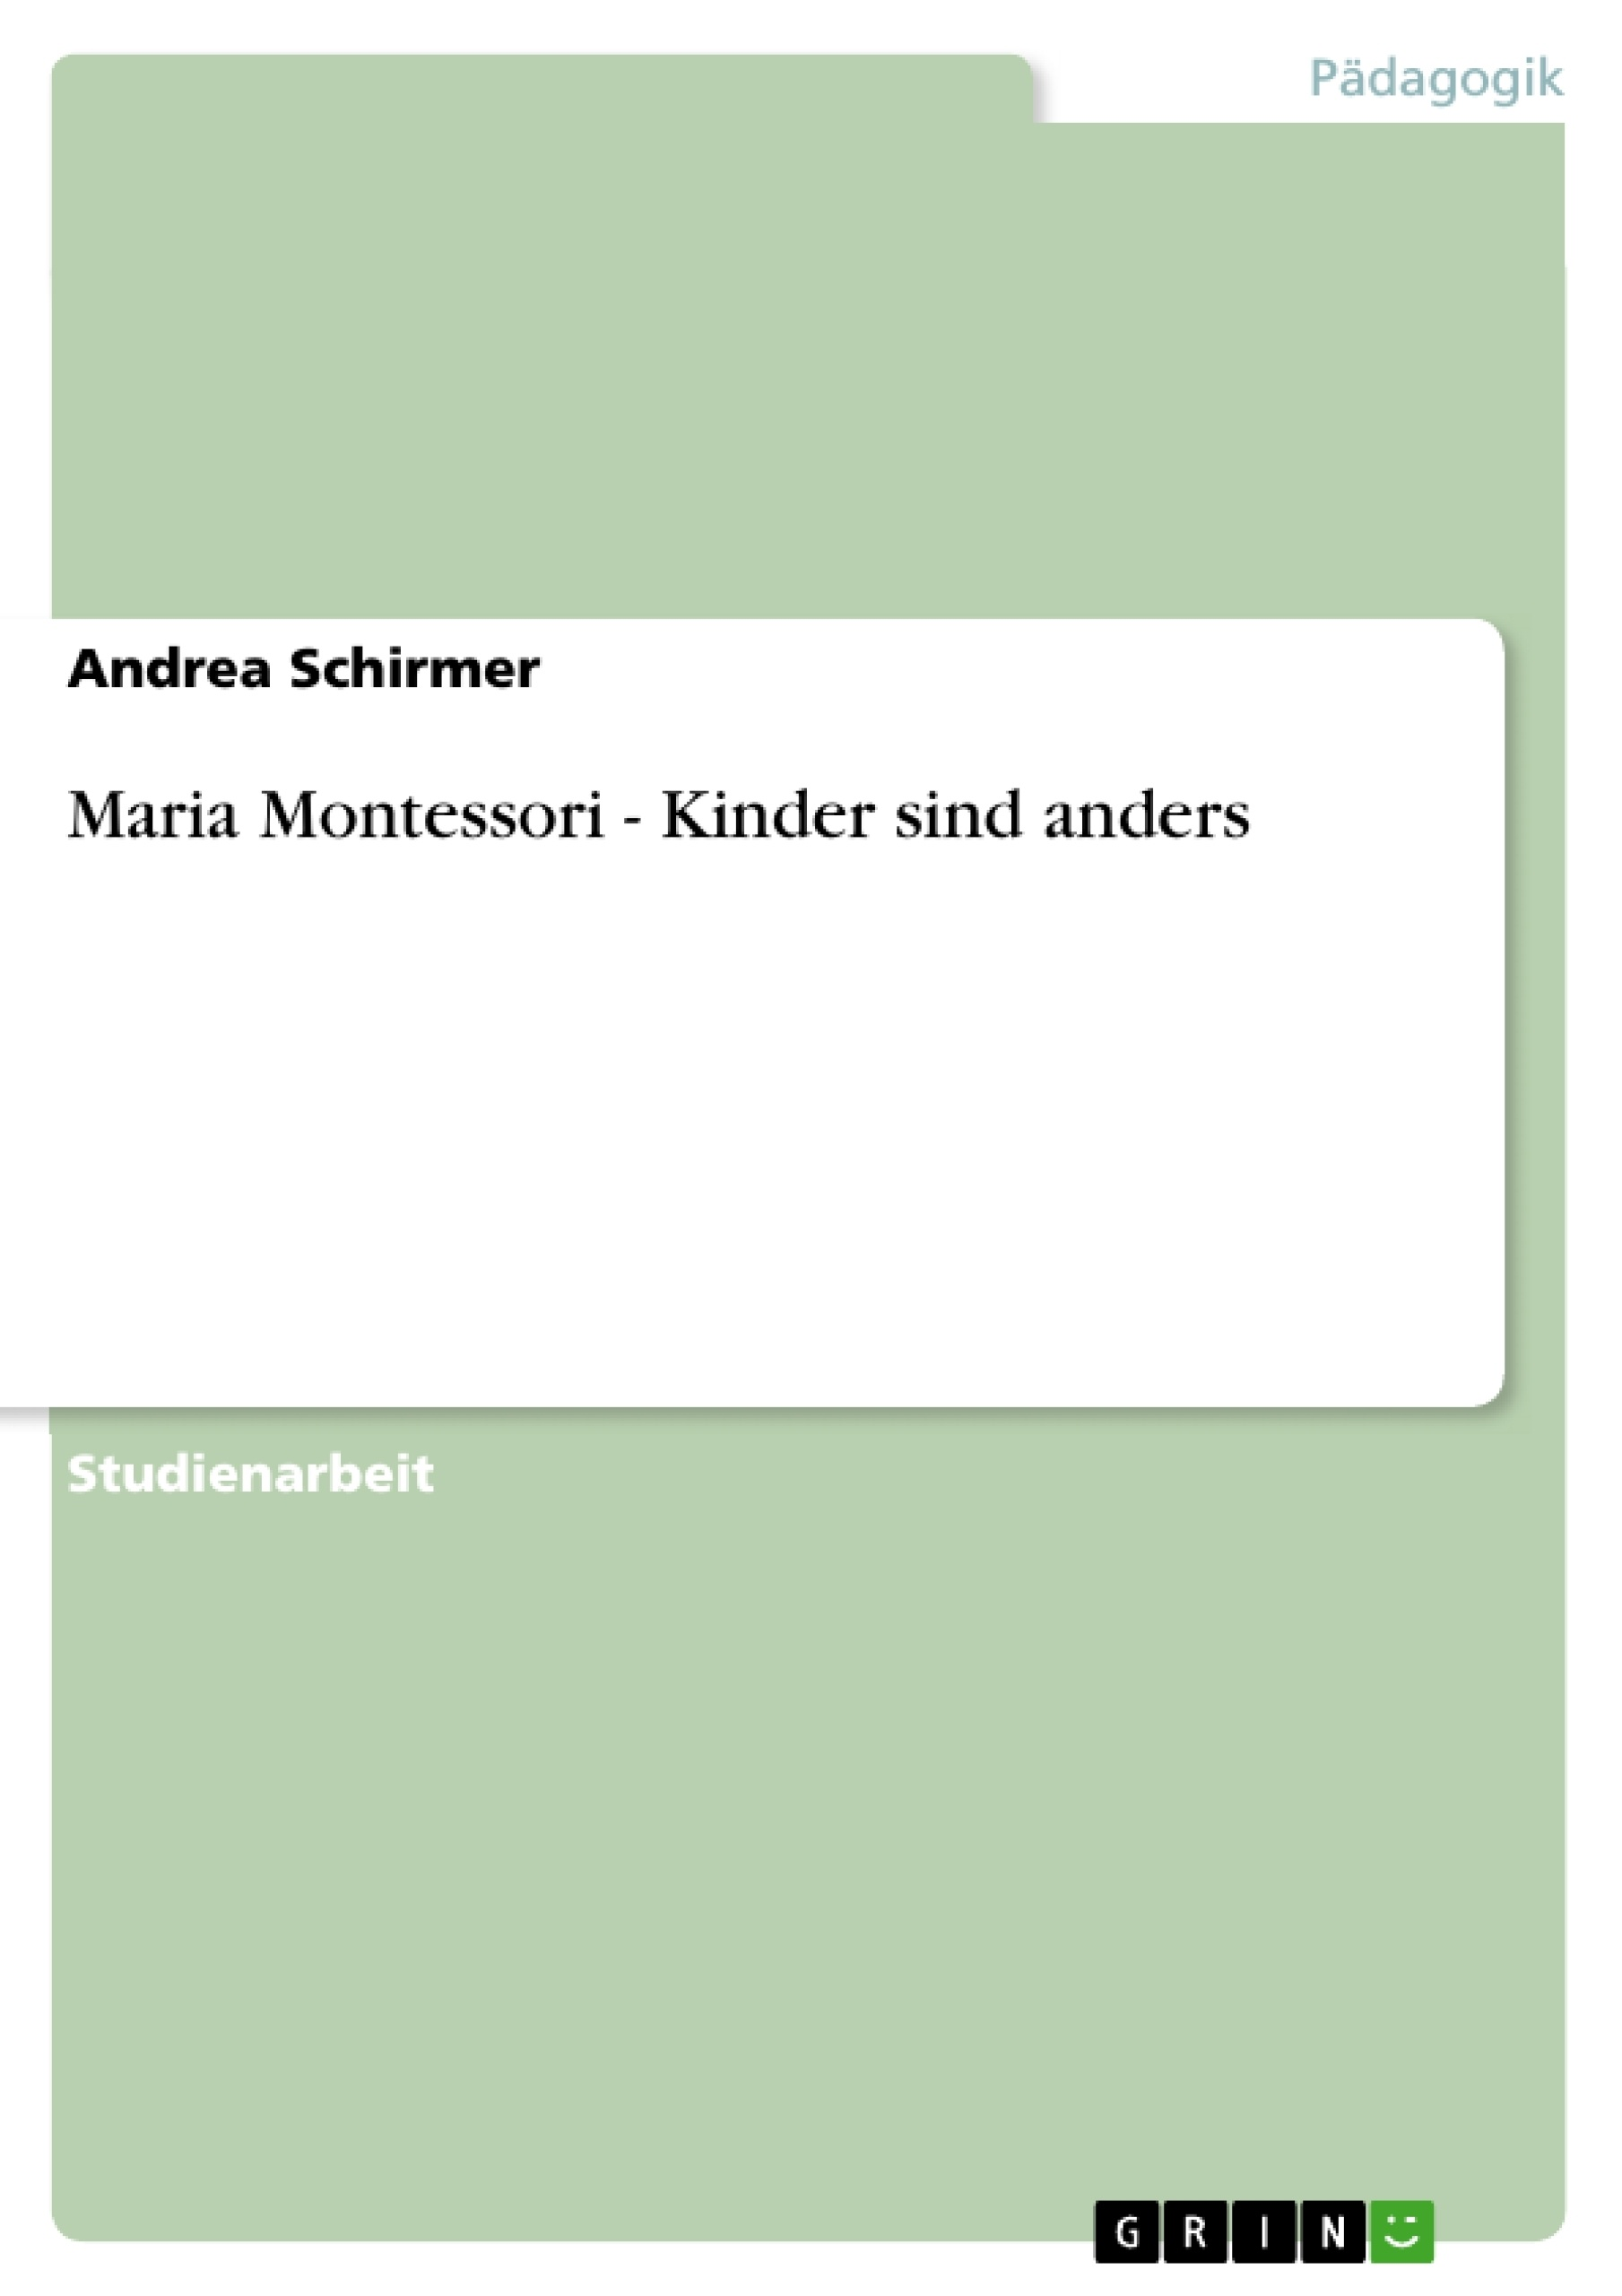 Titel: Maria Montessori - Kinder sind anders